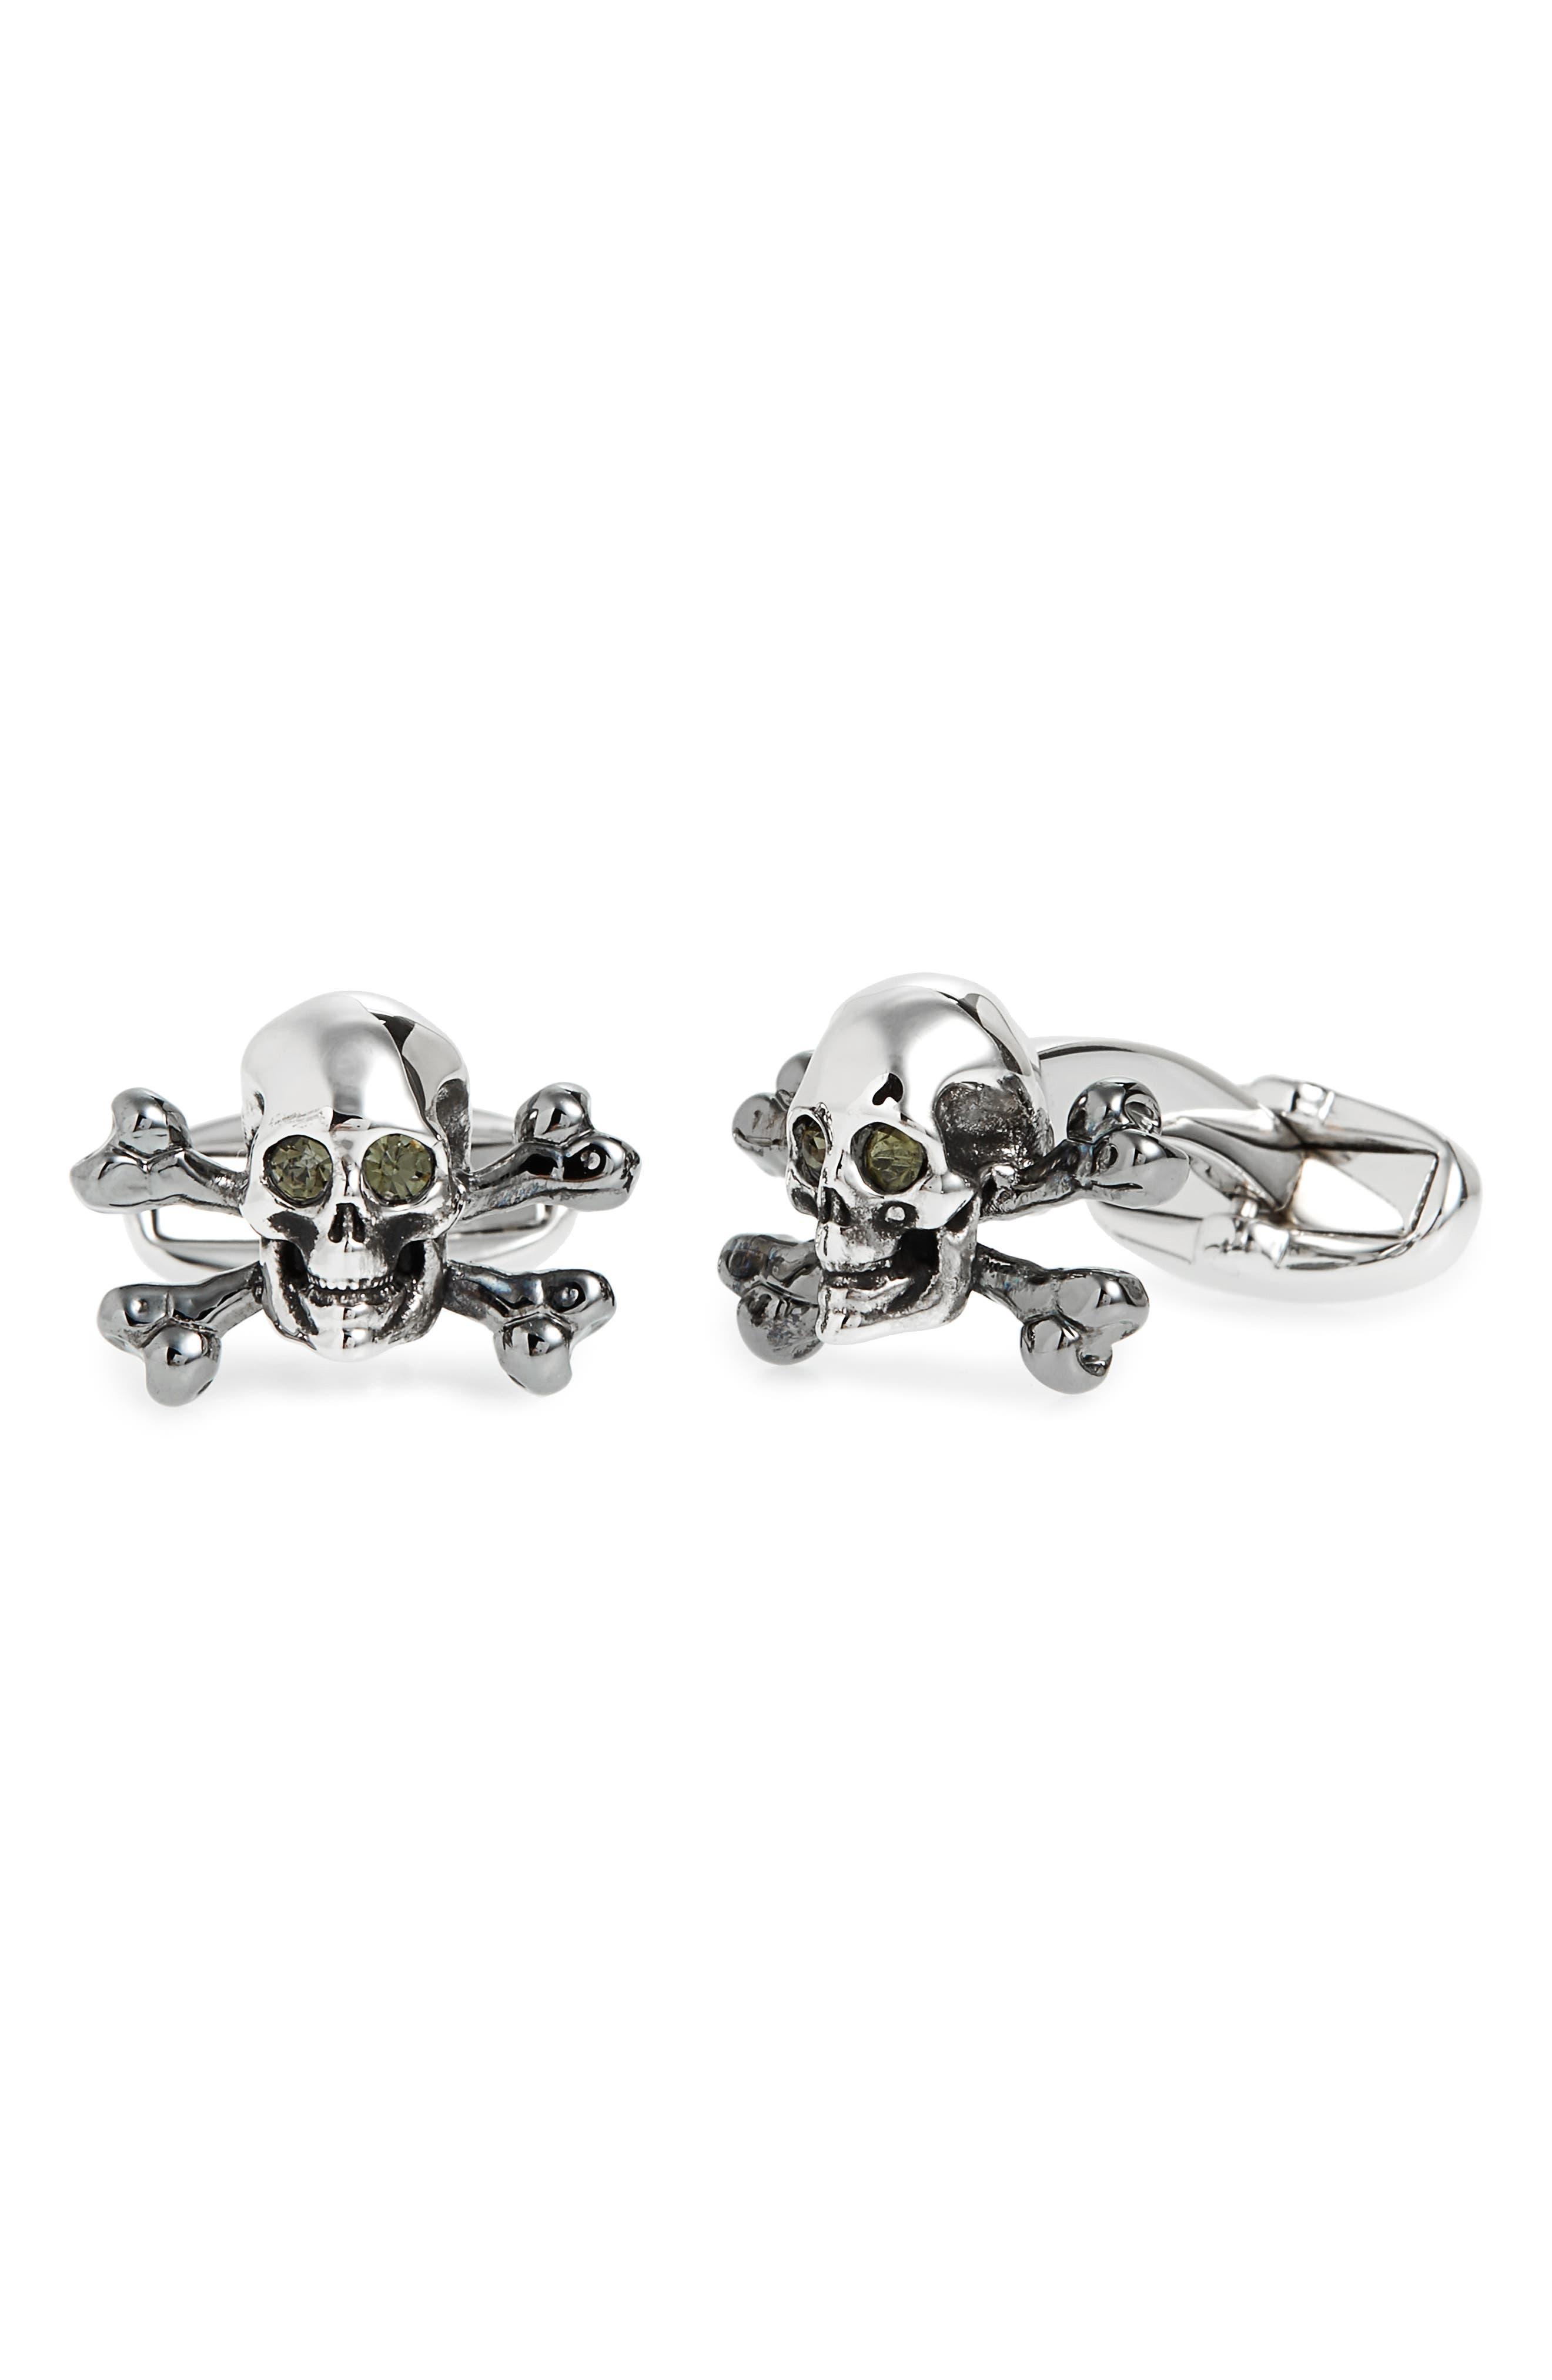 Skull & Crossbones Cuff Links,                             Main thumbnail 1, color,                             003